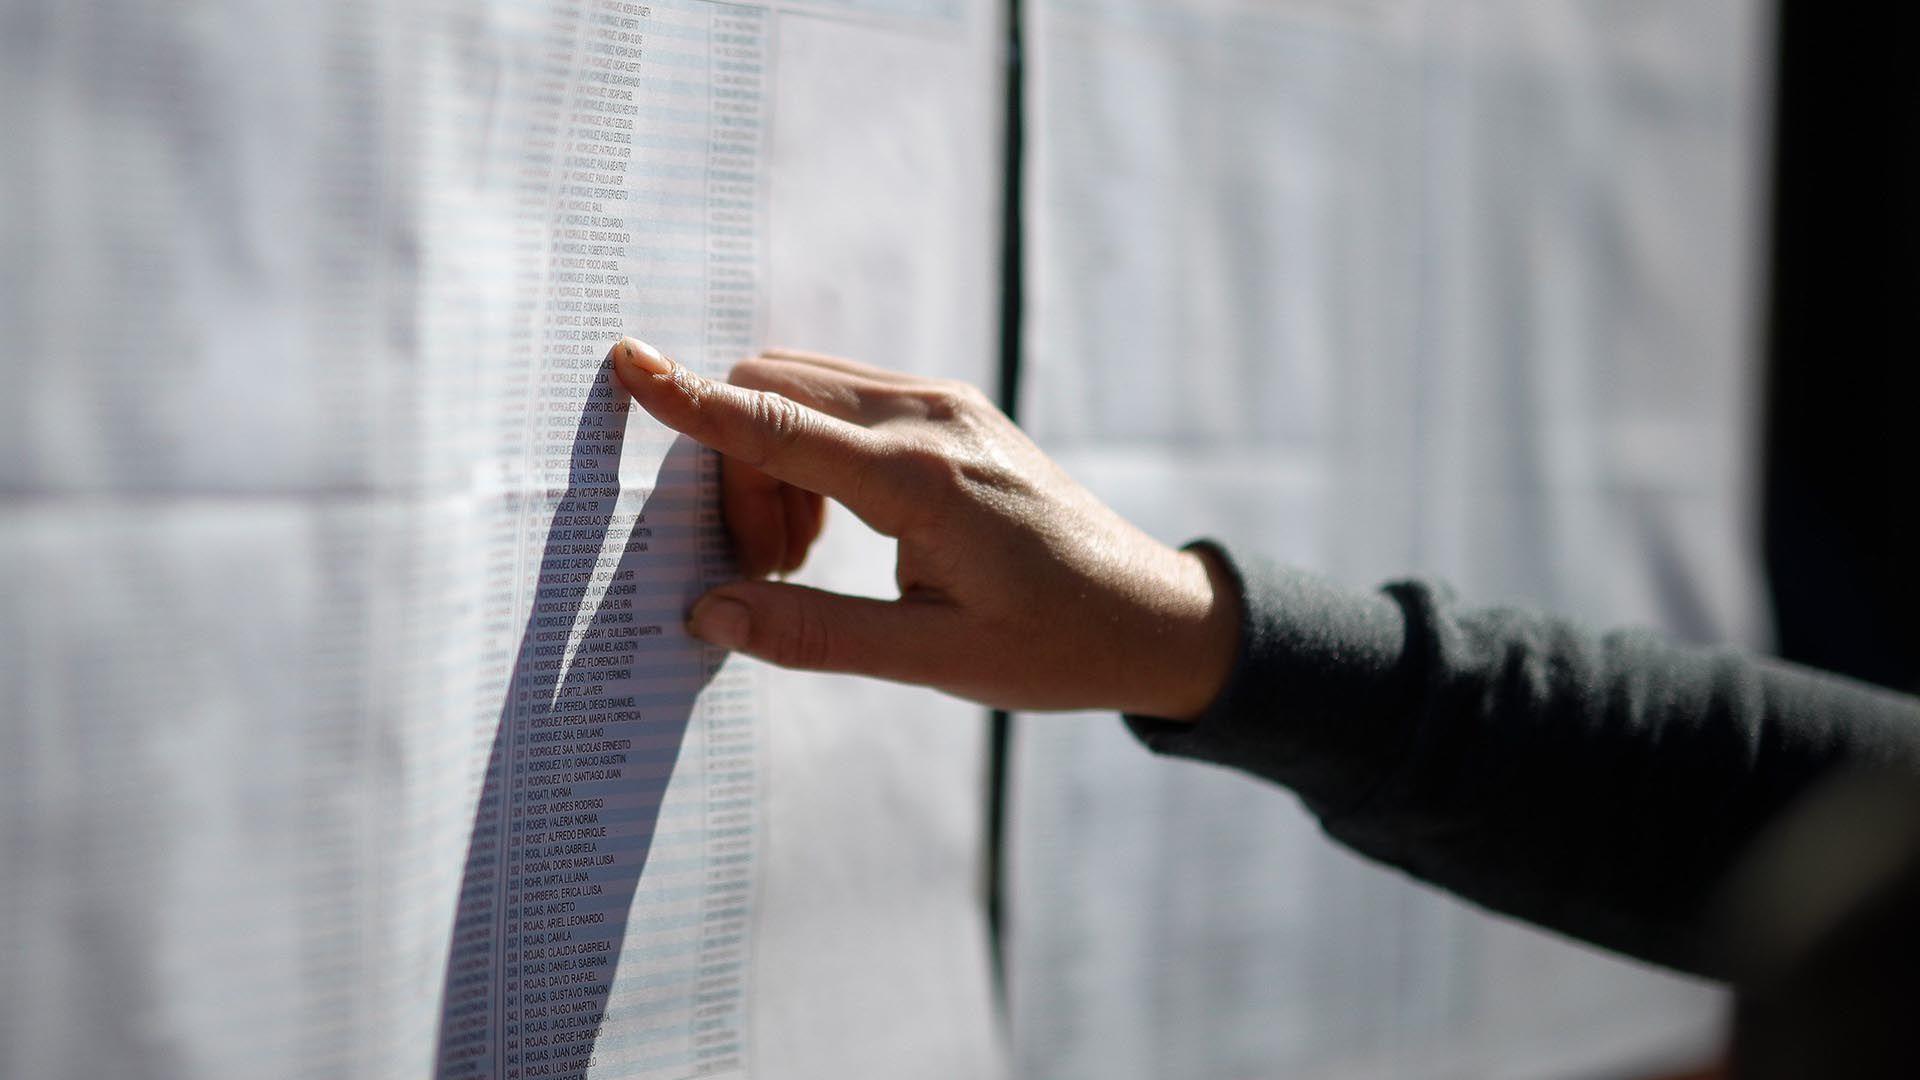 La Argentina elegirá presidente este domingo (EFE/Juan Ignacio Roncoroni)